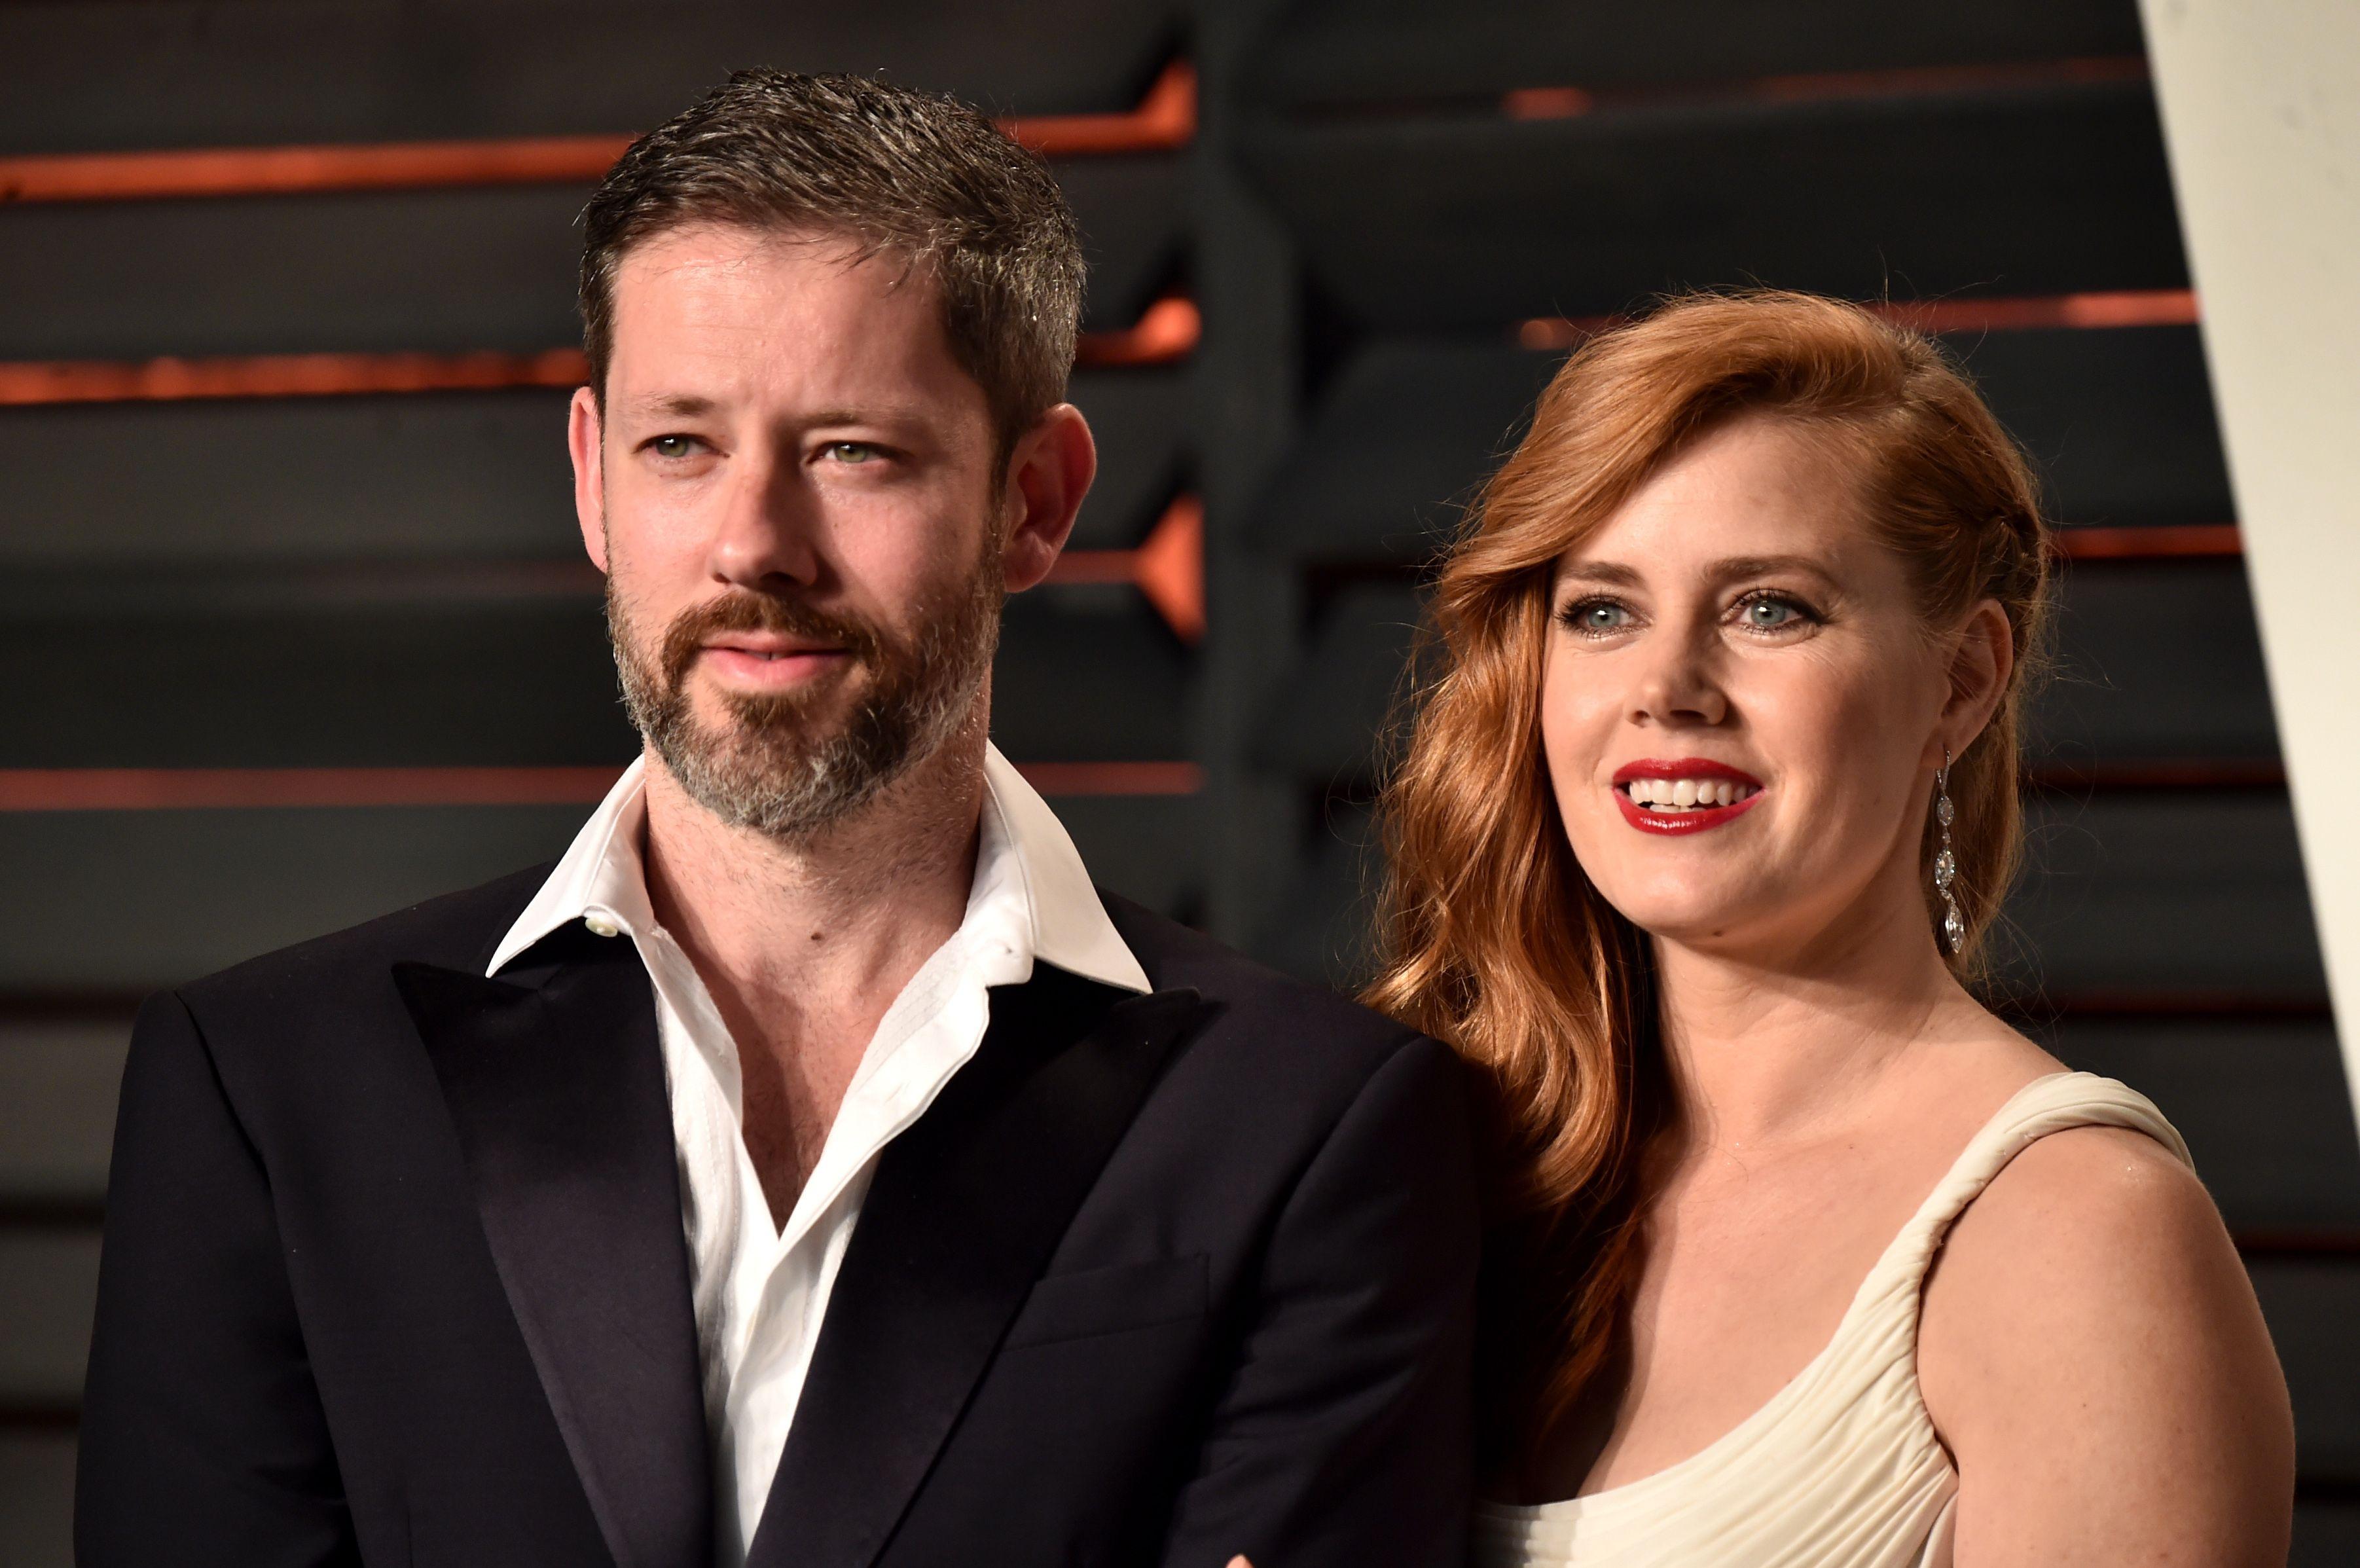 All About Darren Le Gallo, Amy Adams' Artist Husband